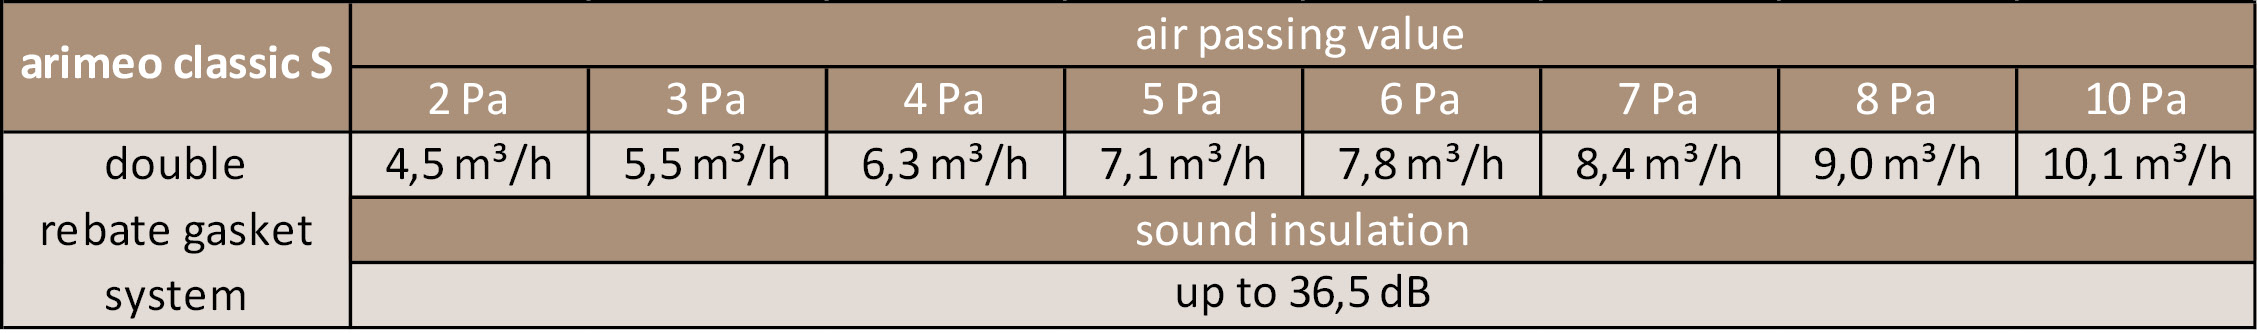 arimeo classic S performance data double